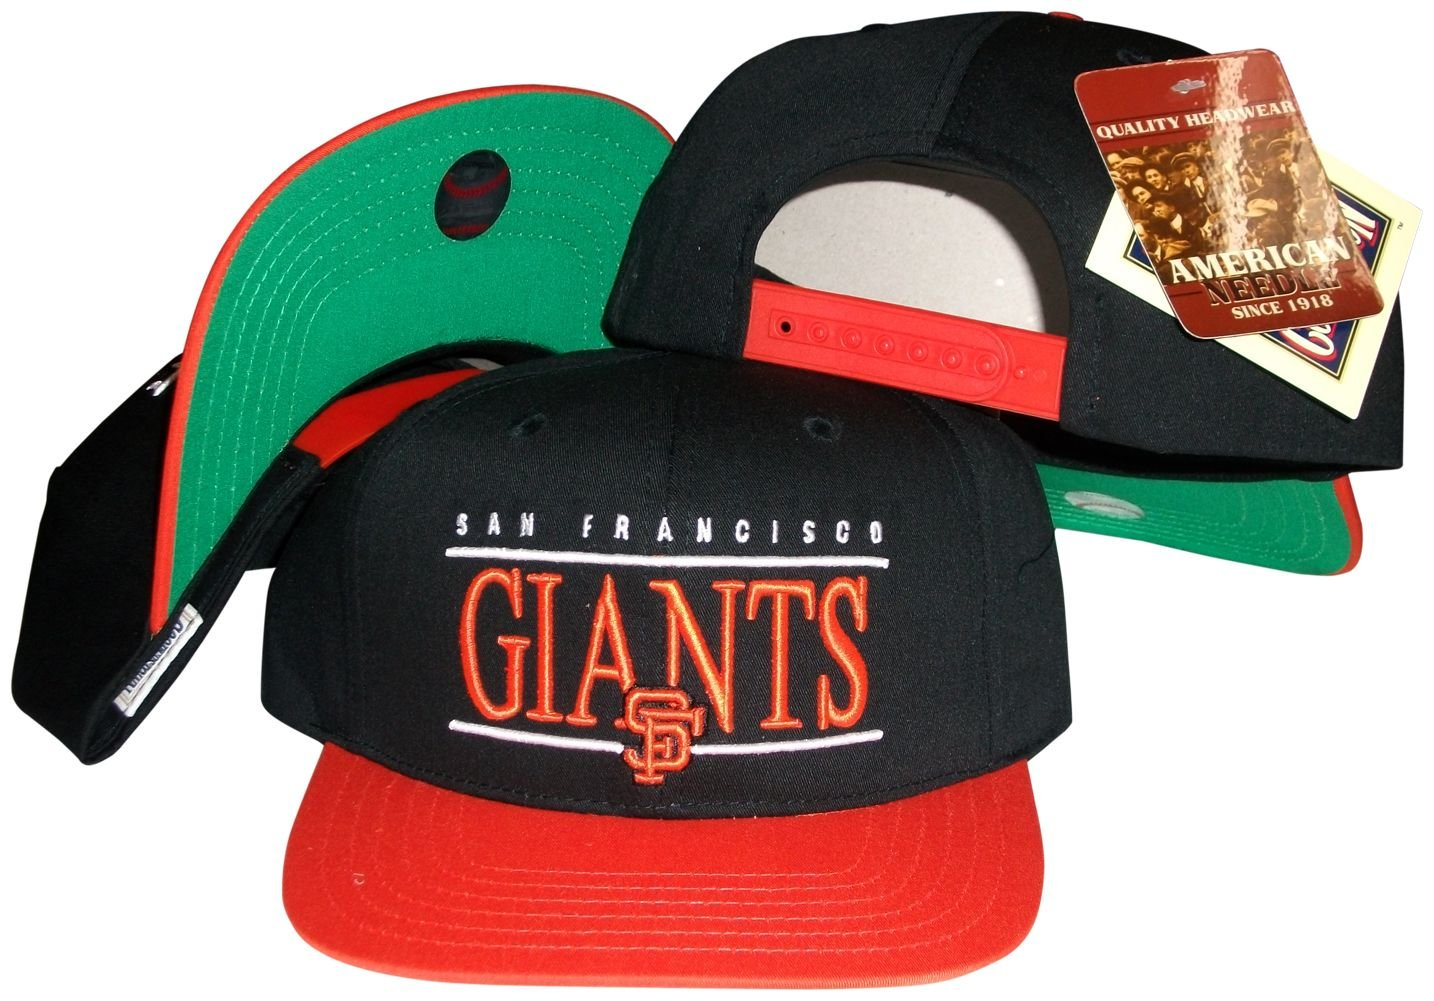 Amazon.com   San Francisco Giants Black Orange Two Tone Snapback Adjustable  Plastic Snap Back Hat Cap   Sports Fan Baseball Caps   Sports   Outdoors 98232eb0dfe7